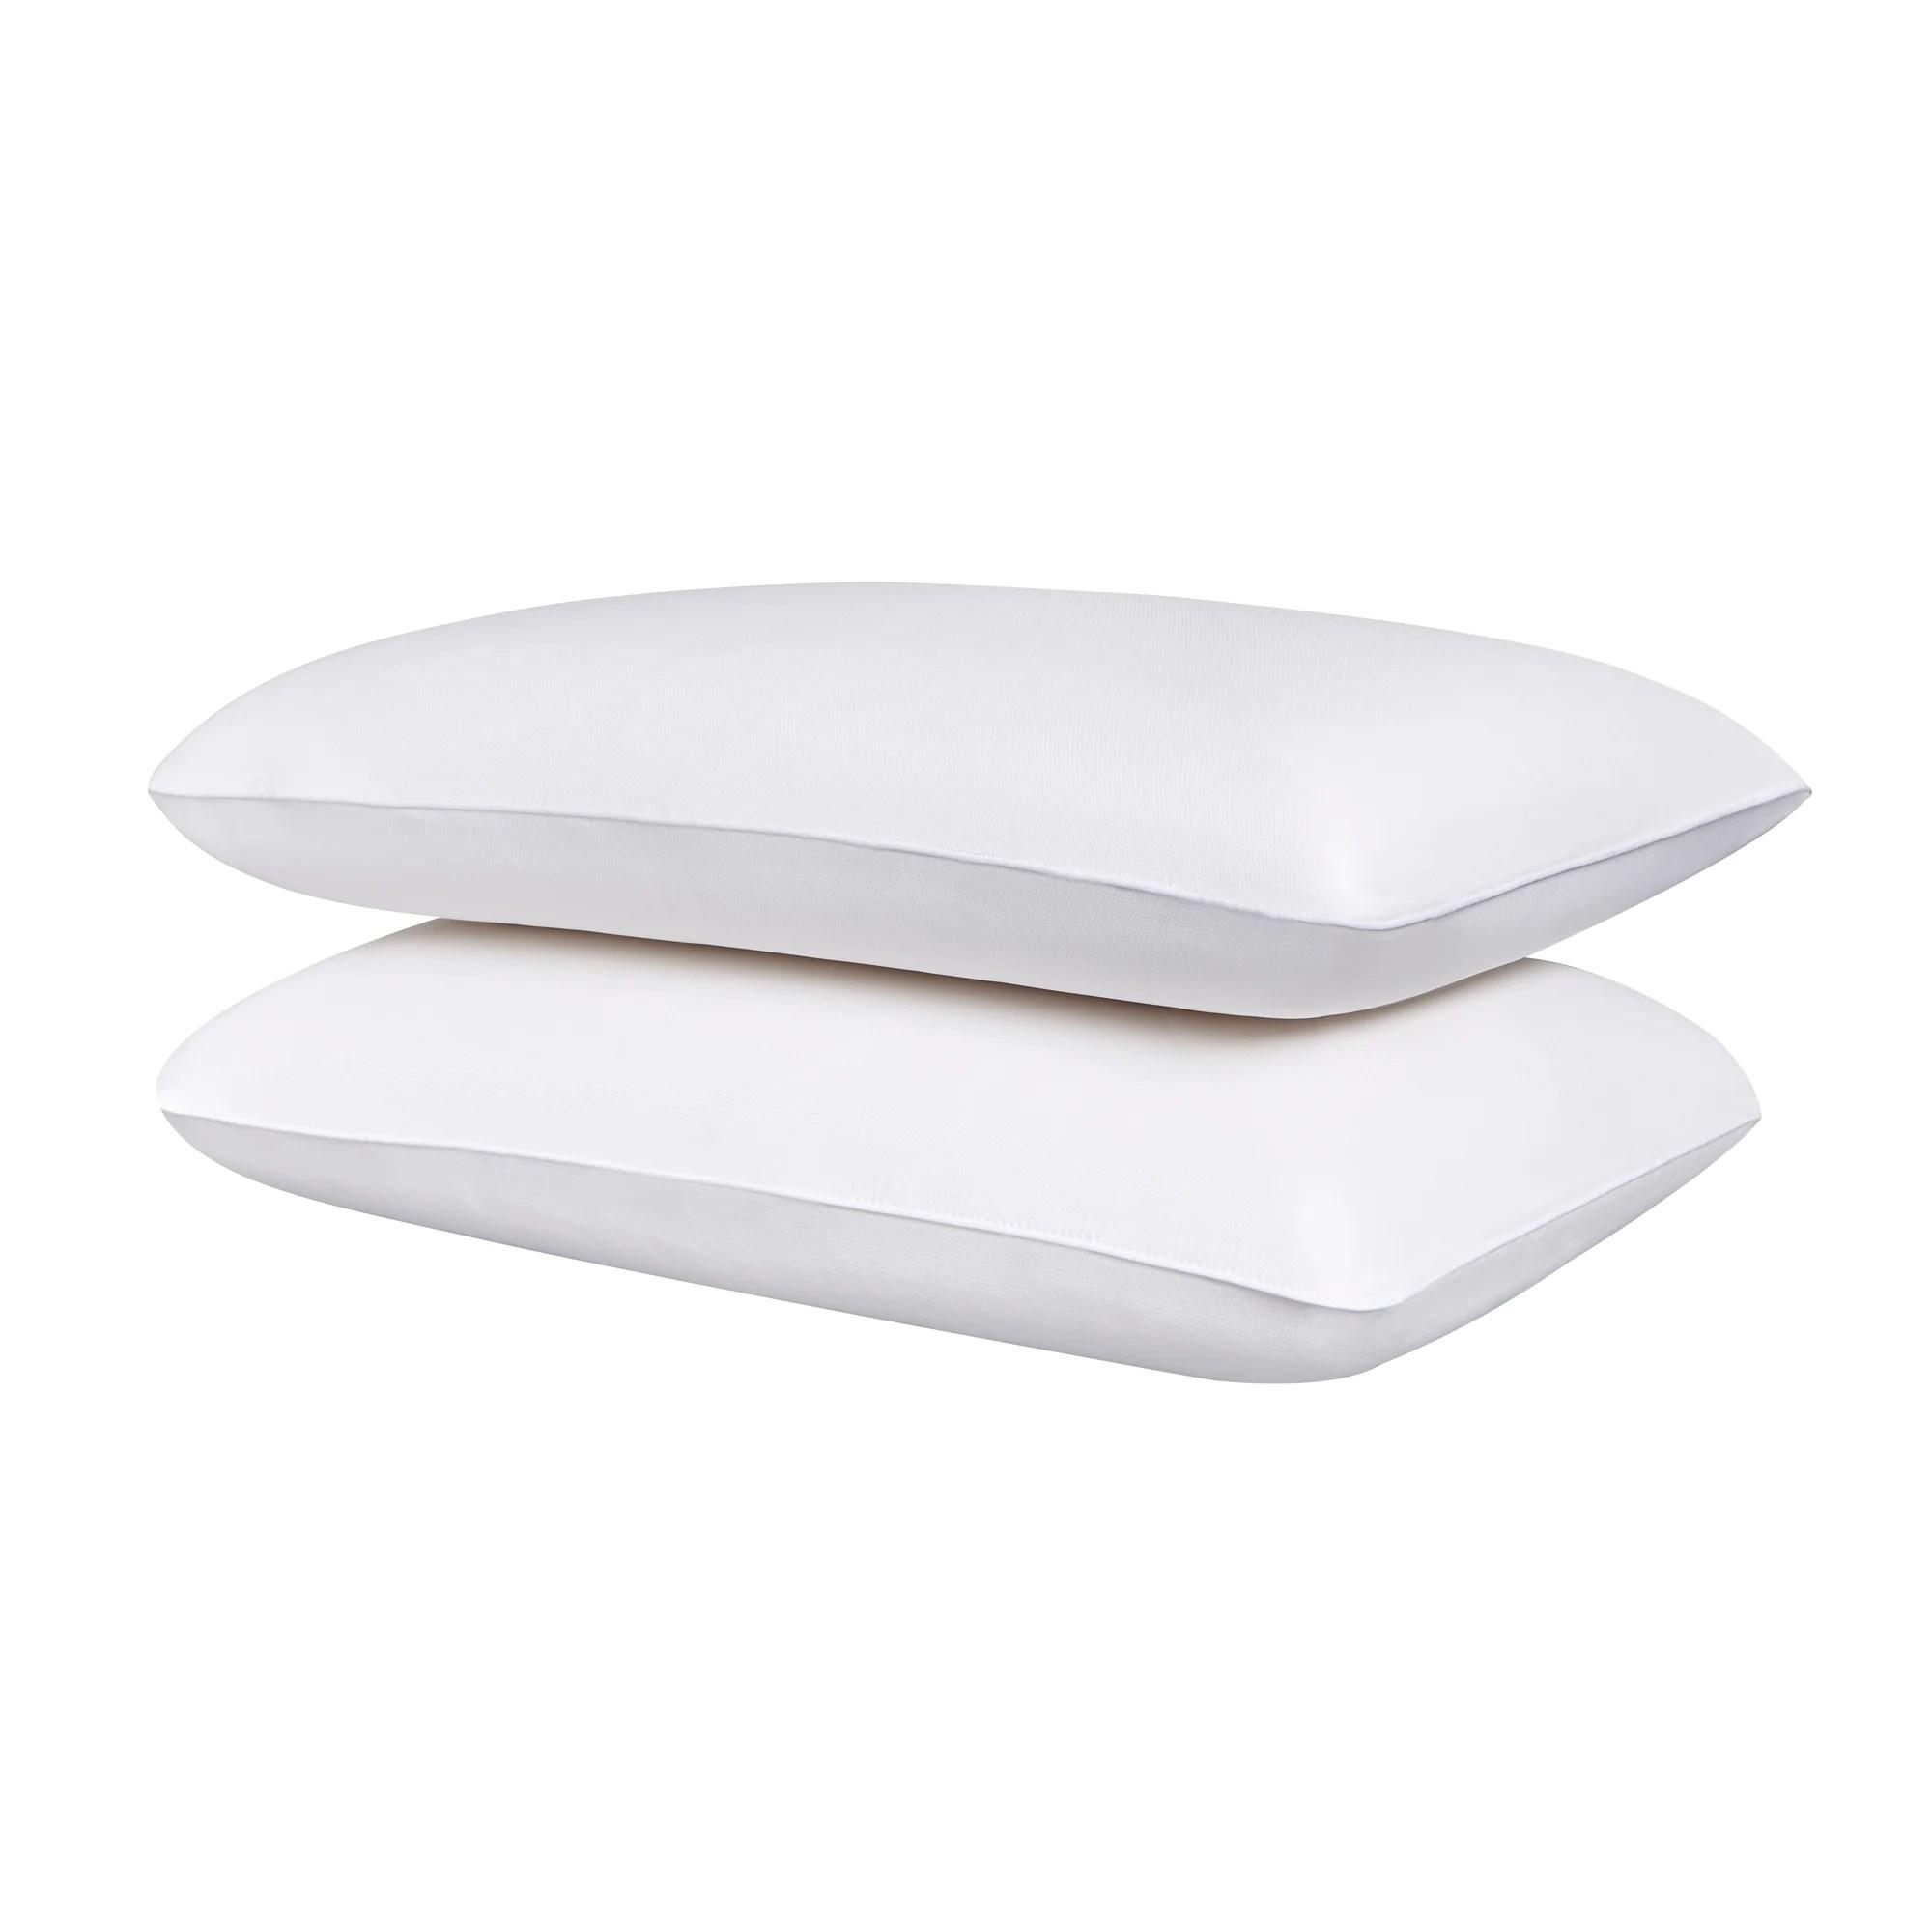 memory foam pillows twin pack